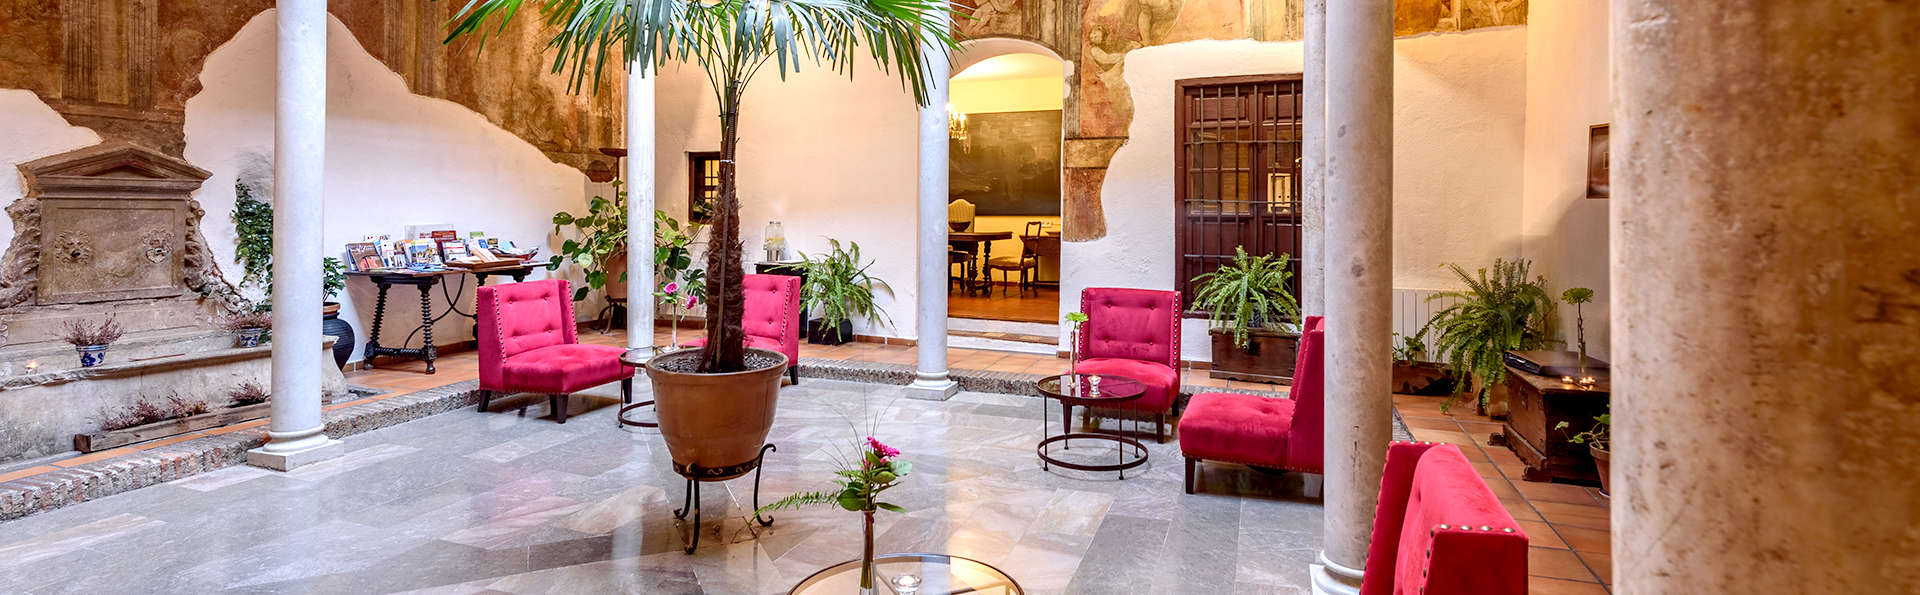 Hotel Palacio de Santa Inés  - Edit_Lobby.jpg